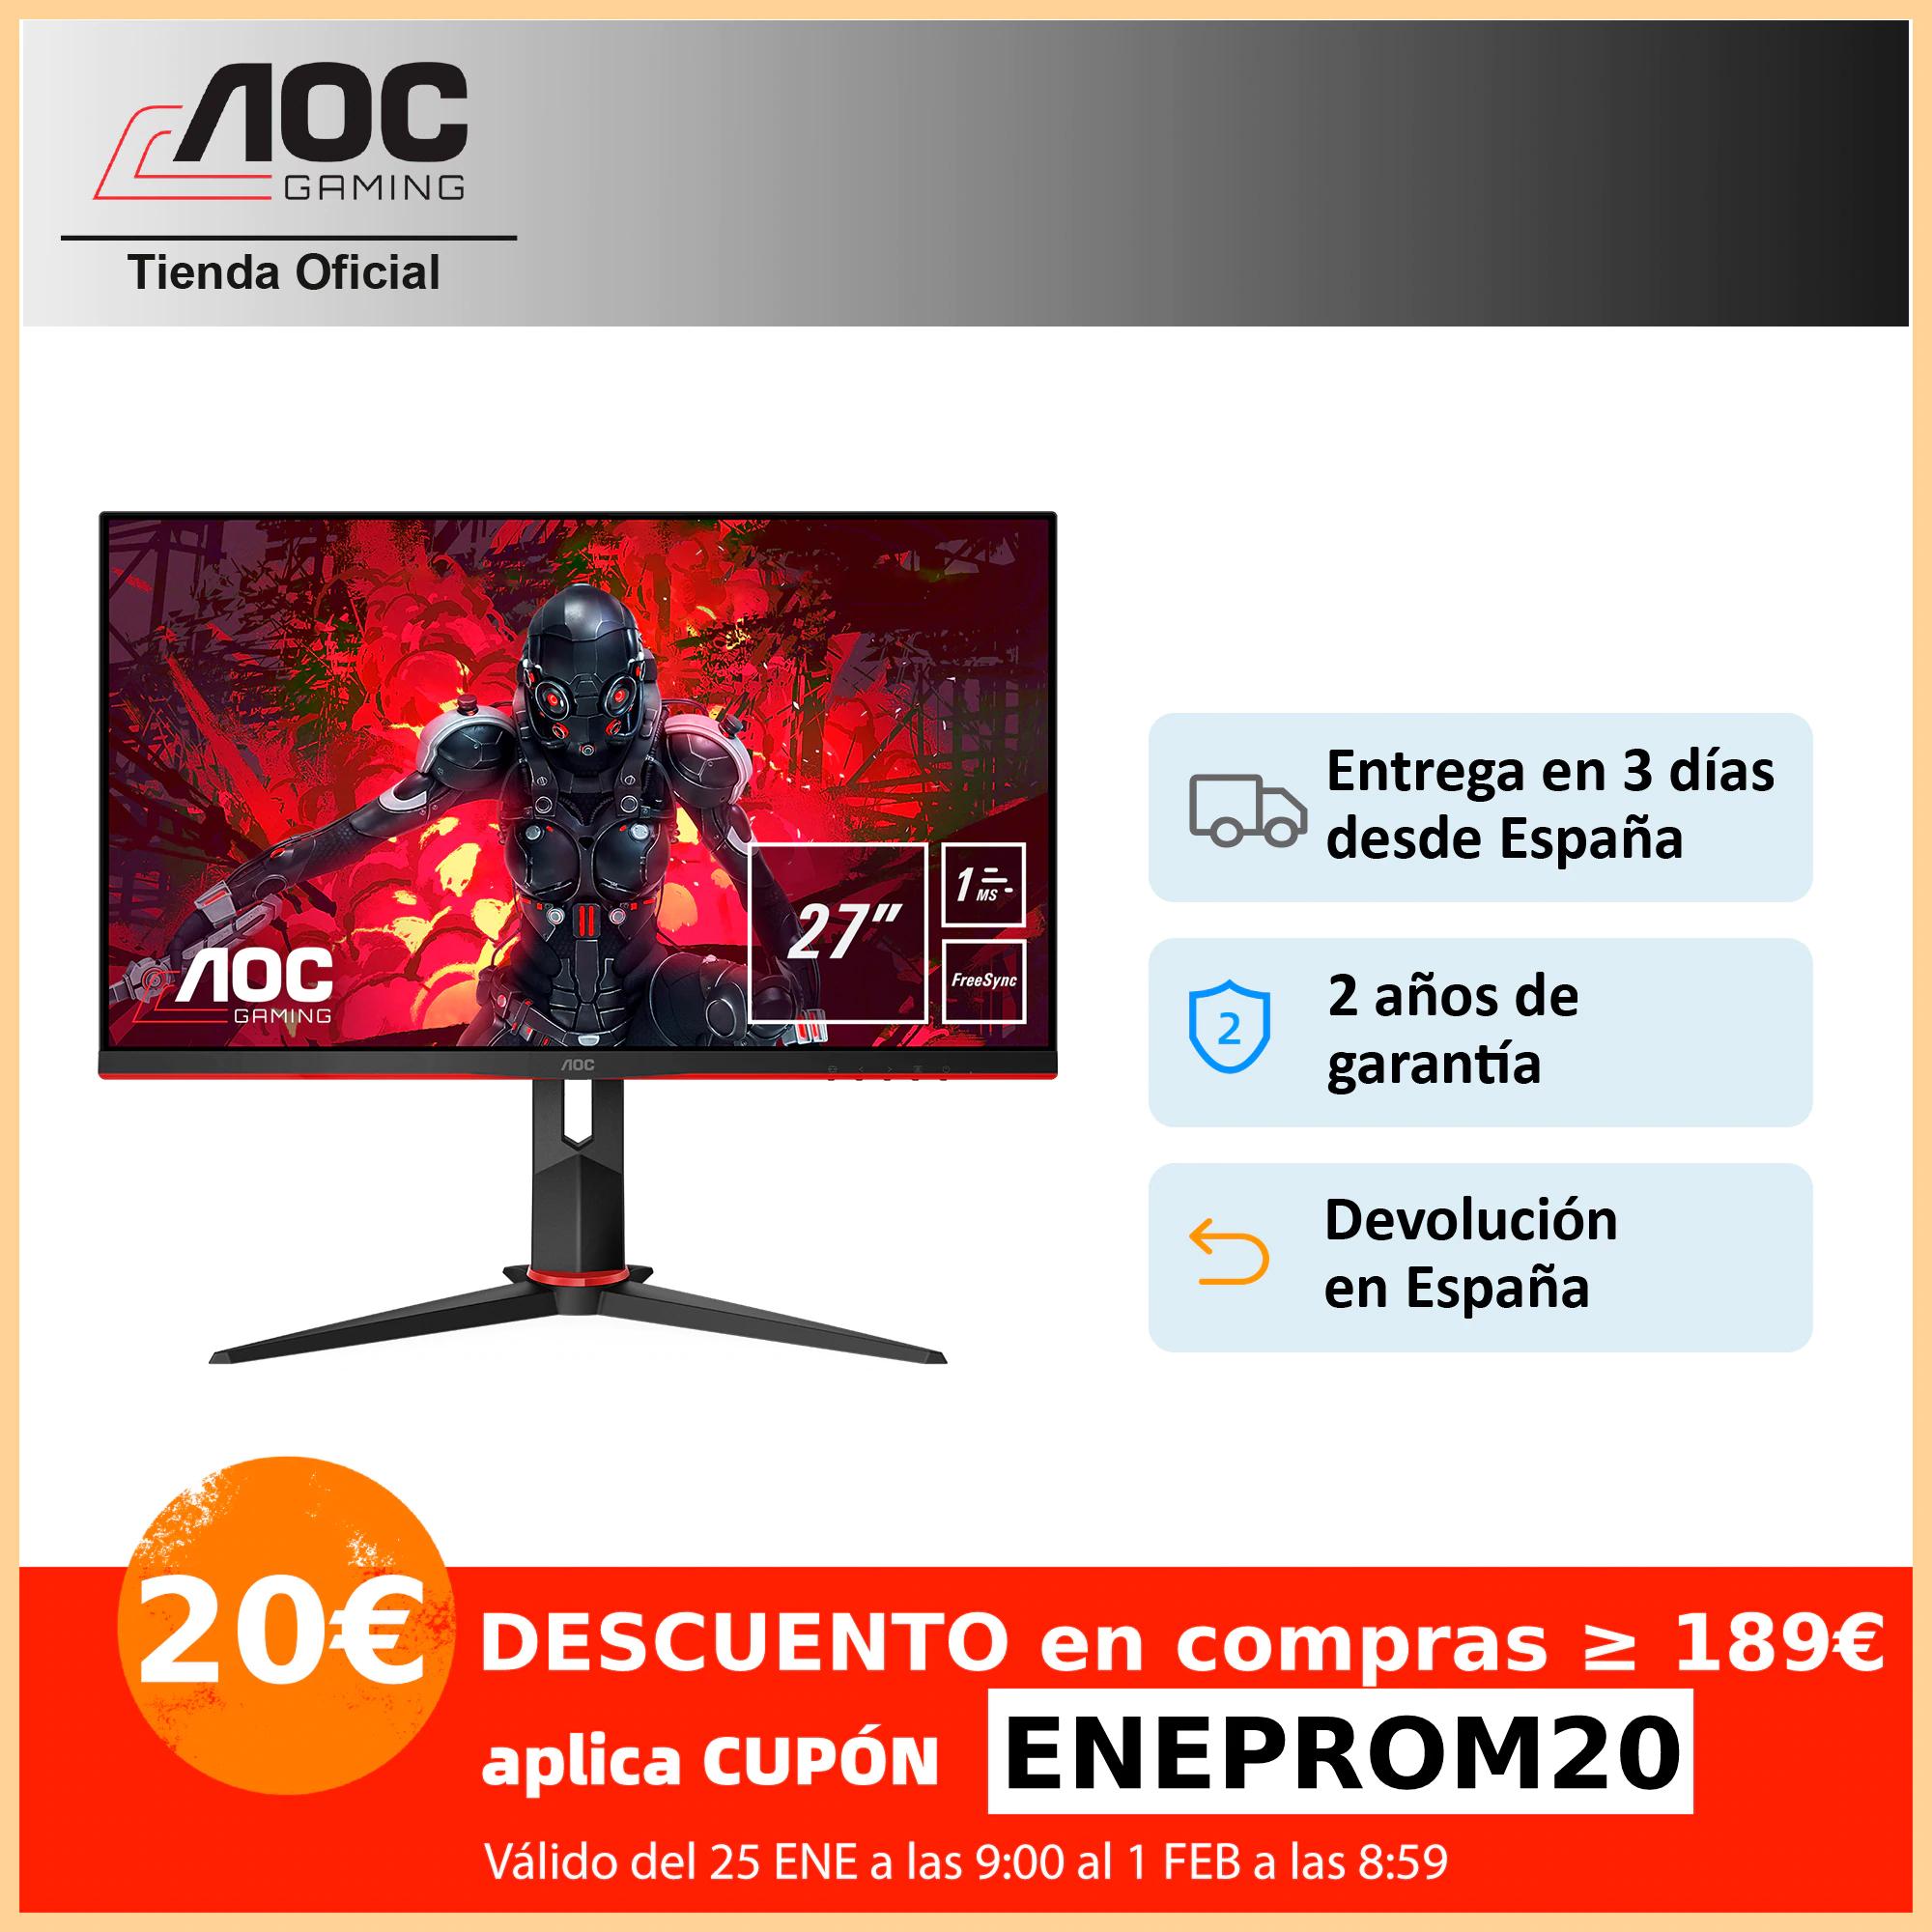 "Monitor PC gaming AOC 27G2U5/BK de 27"" Full HD (1920x1080) IPS, 16:9, 1000:1, 250cd/m, 1ms, 75Hz, FreeSync, FlickerFree, VESA"